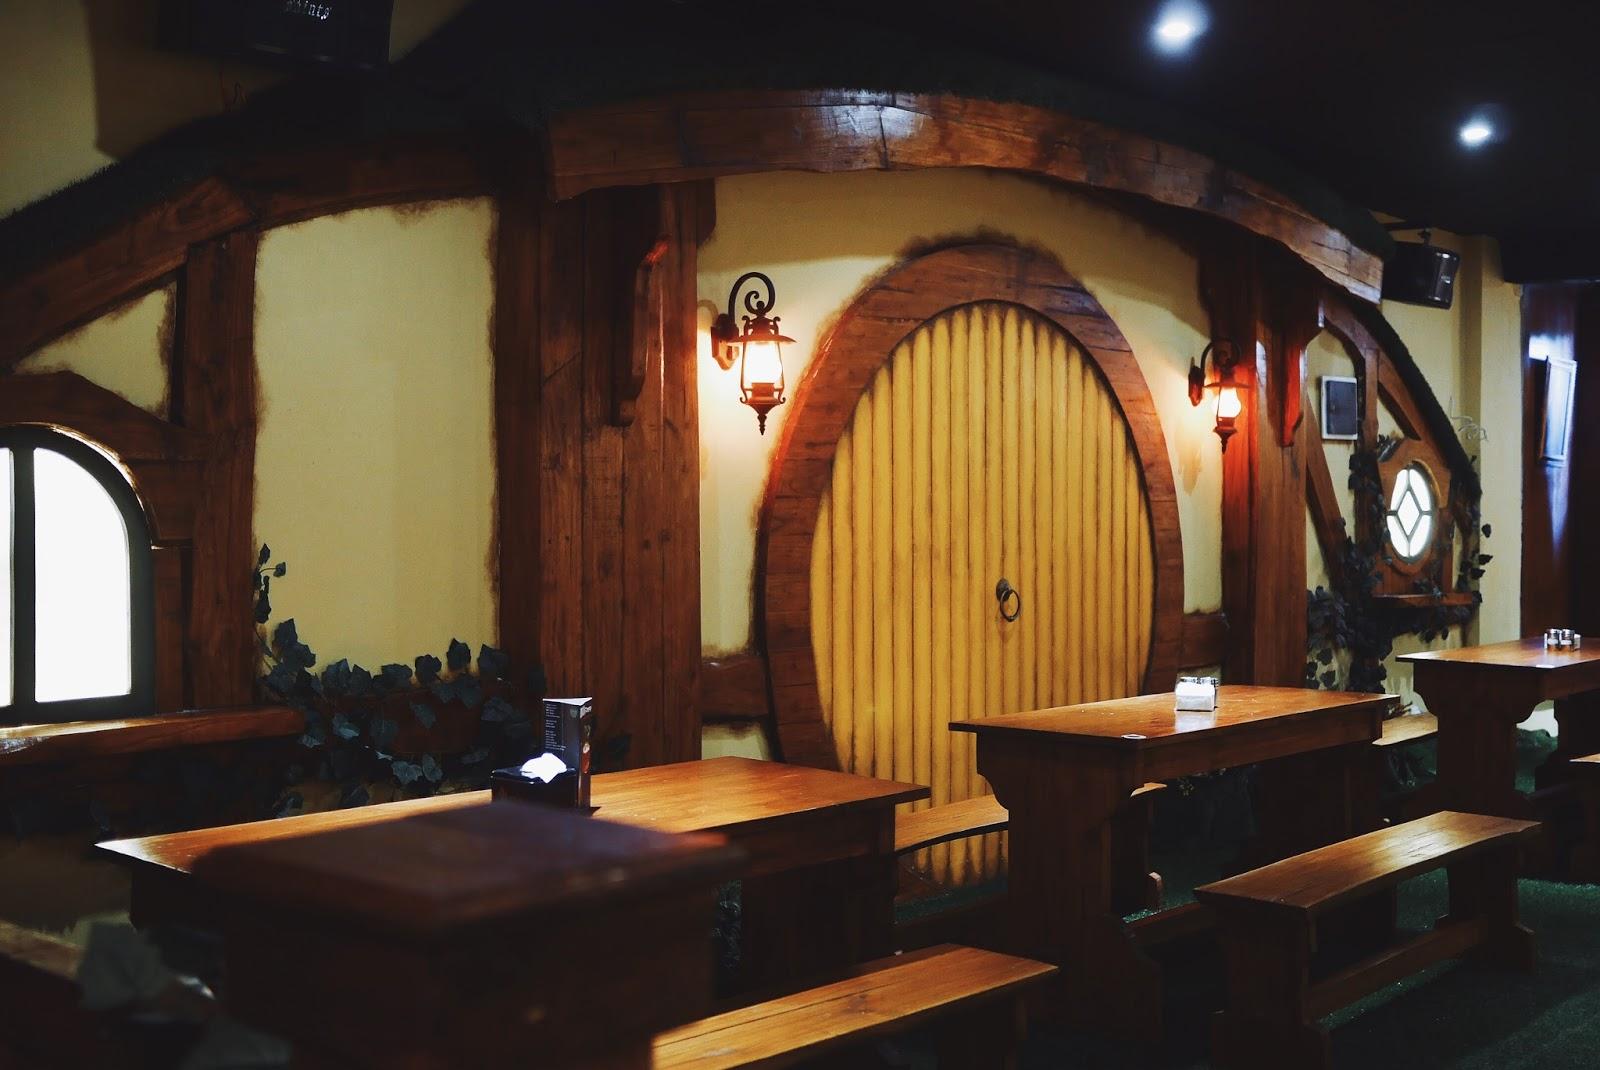 Bake-a-Boo, House of Hobbit